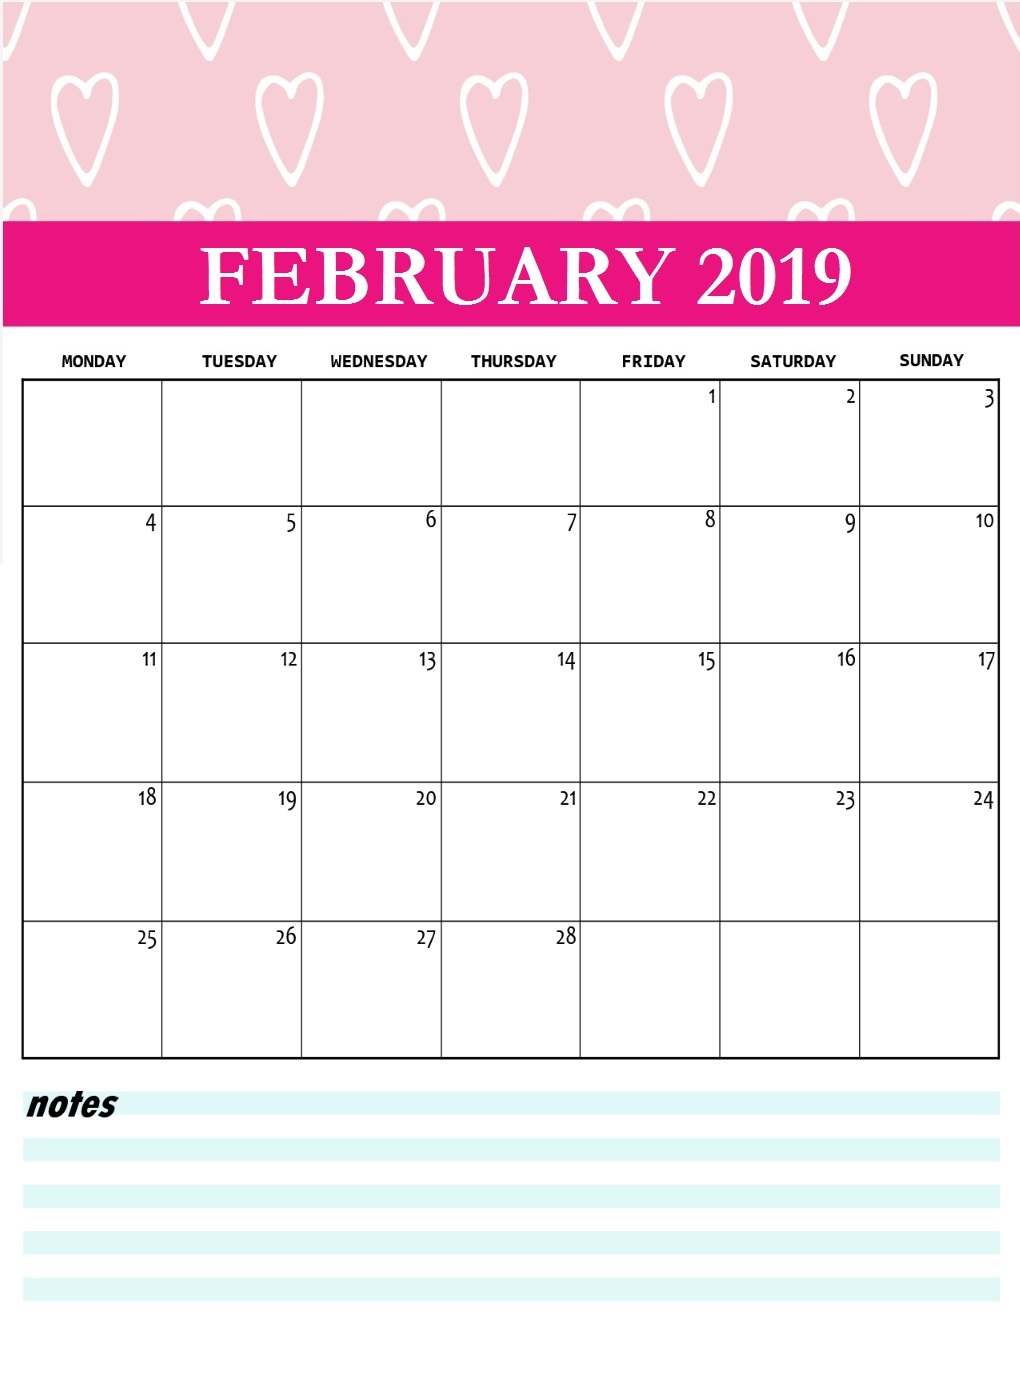 Cute February 2019 Printable Calendar